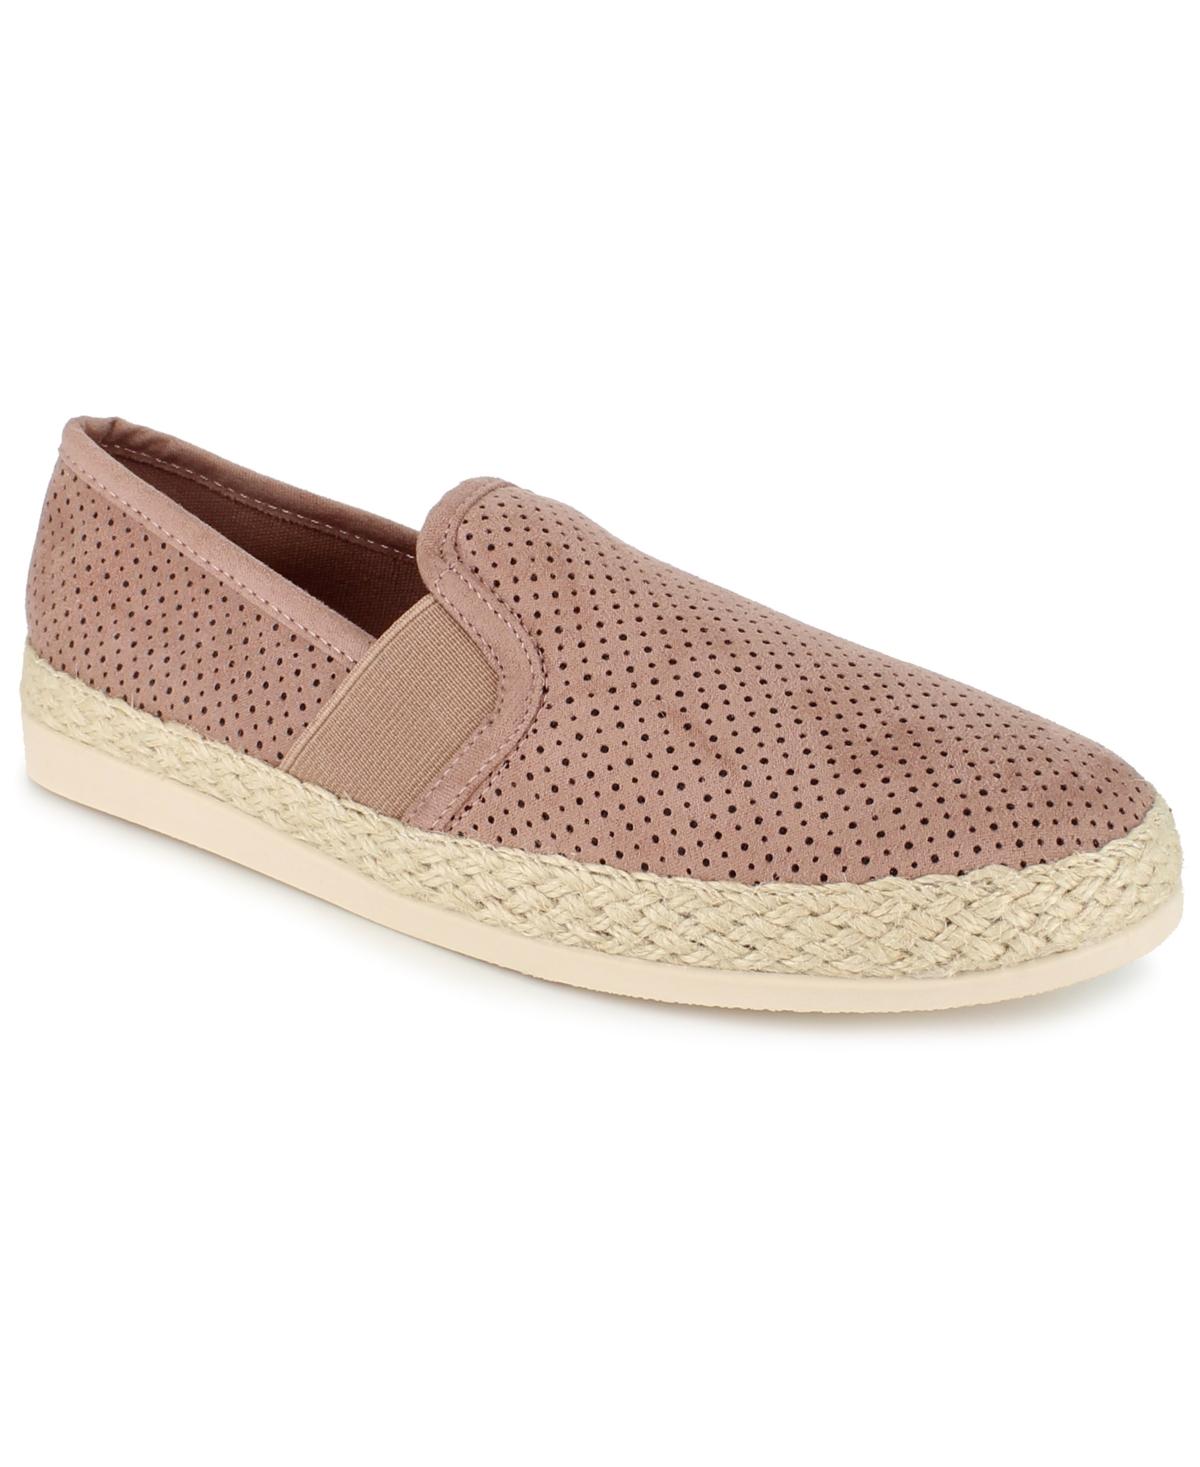 Esprit Elene Slip-On Espadrille Flats, Created for Macy's Women's Shoes